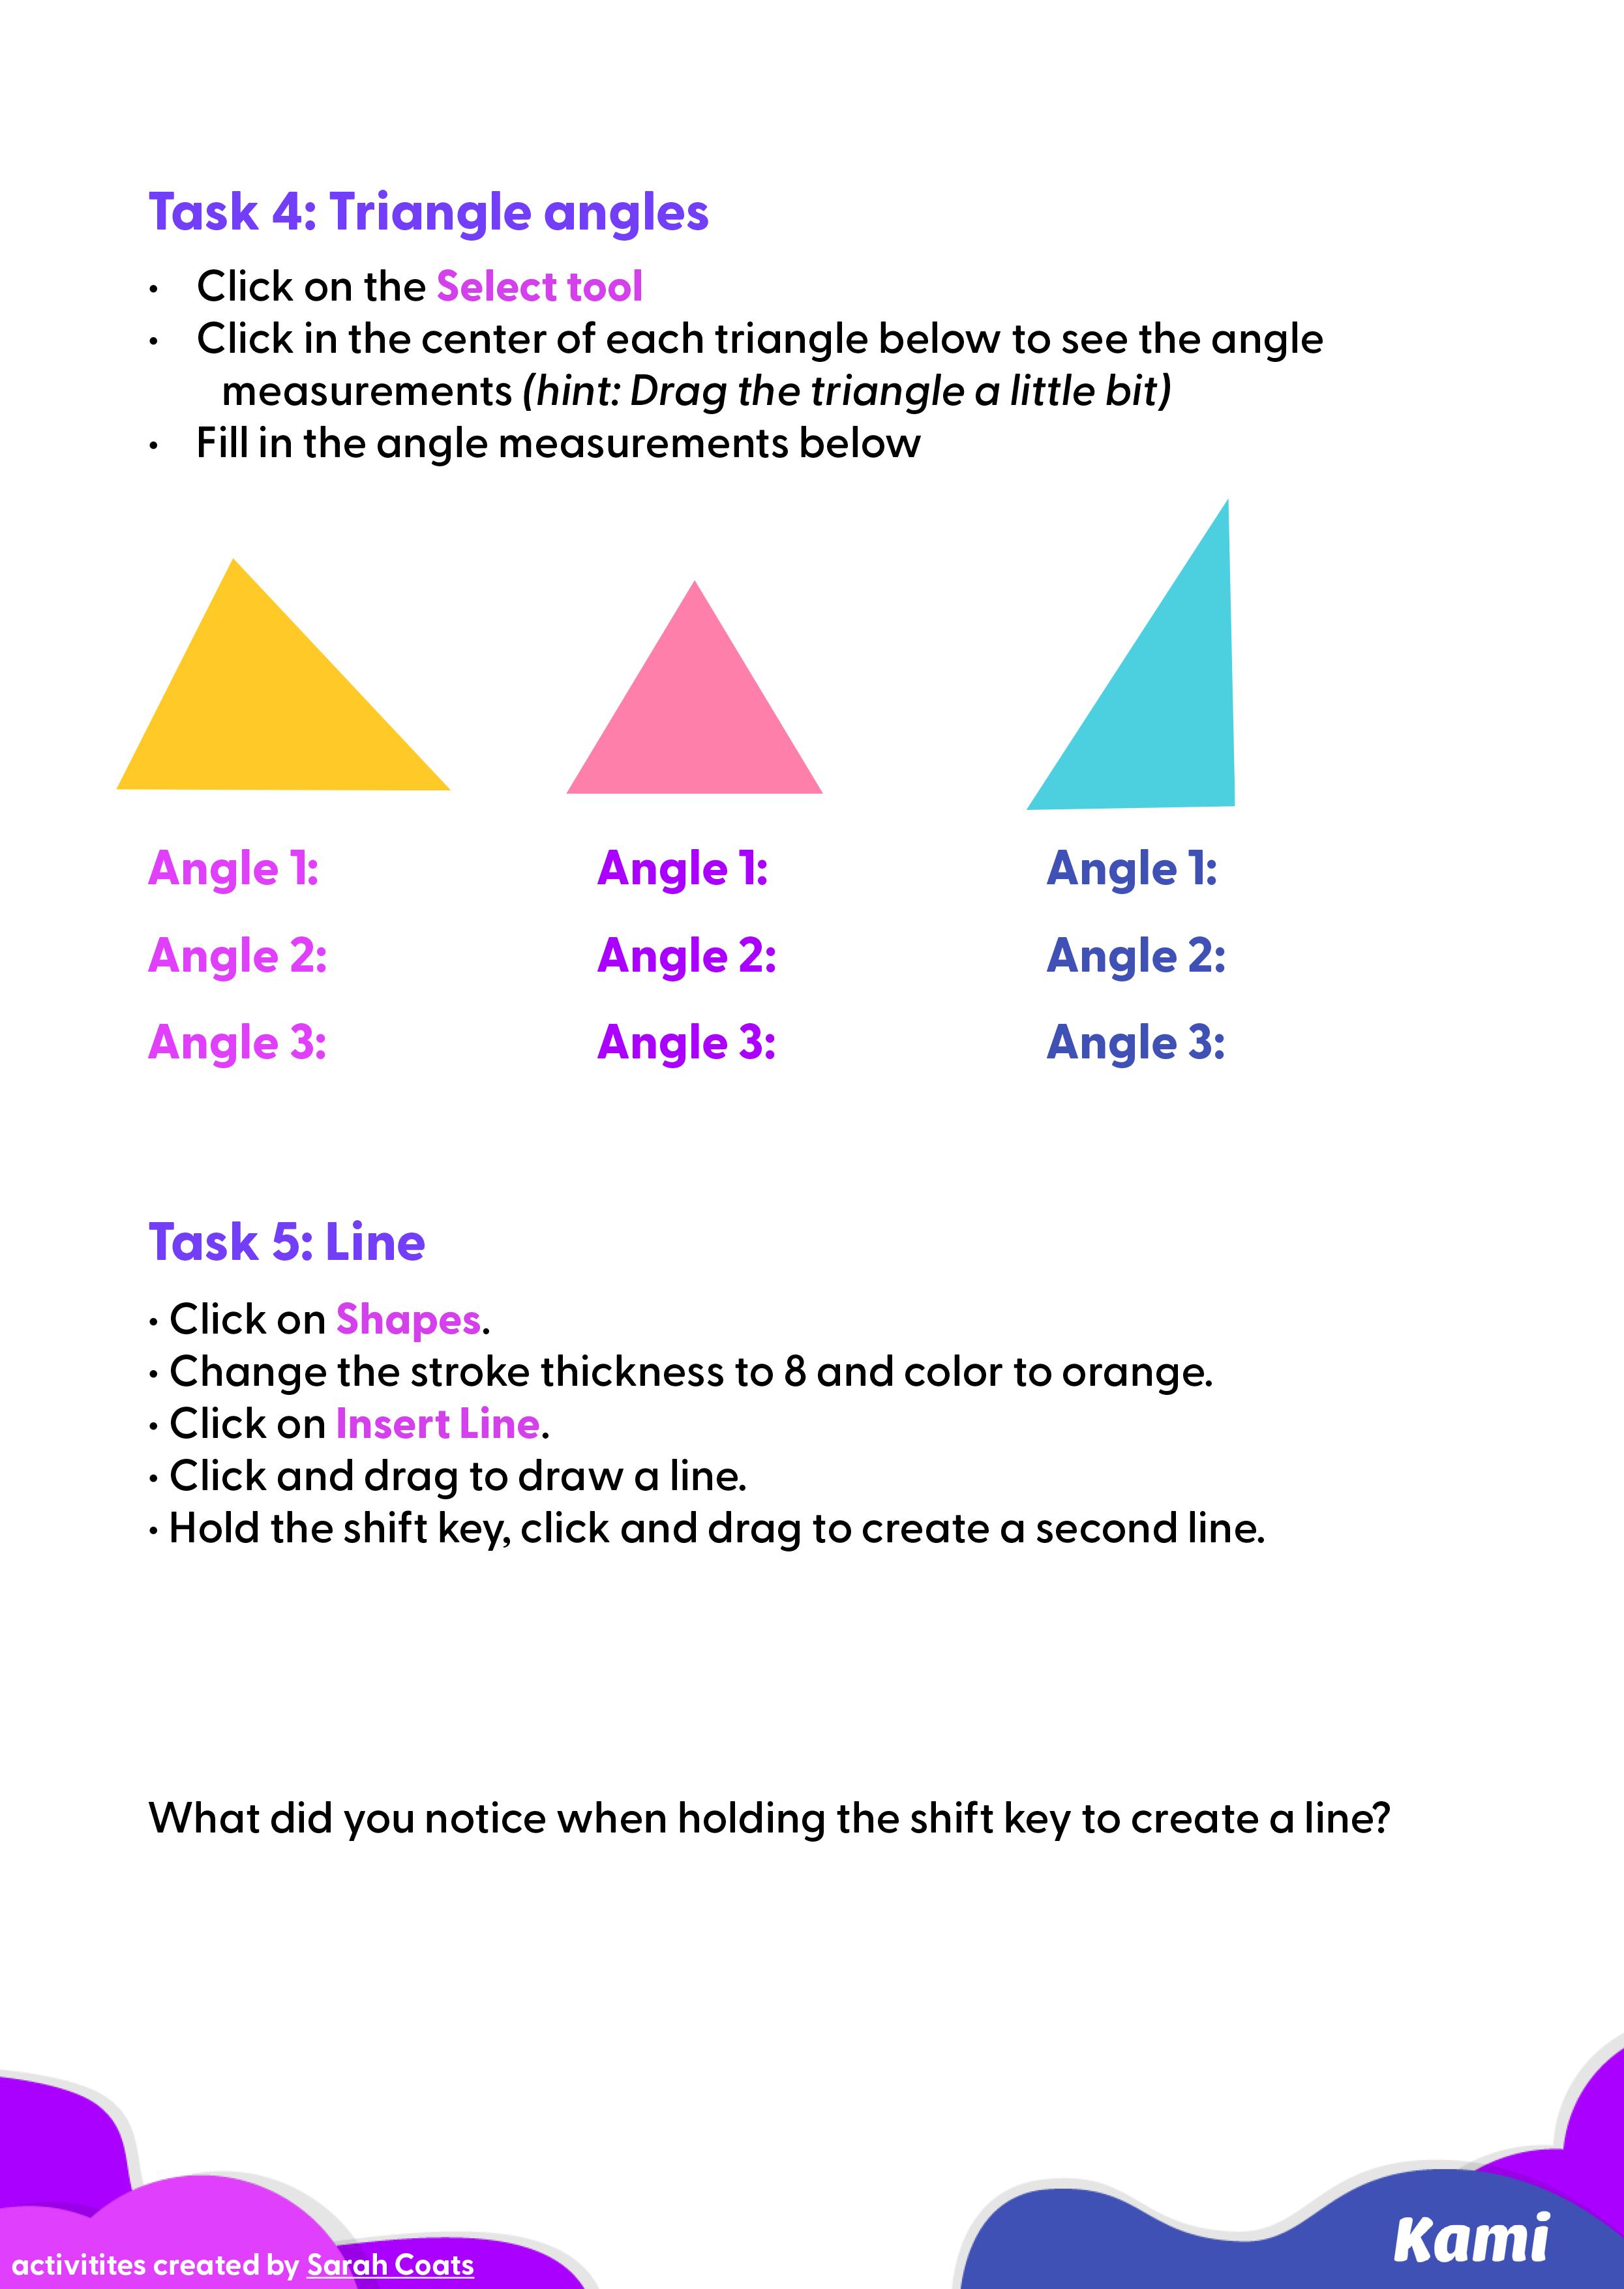 Shapes activity image 3